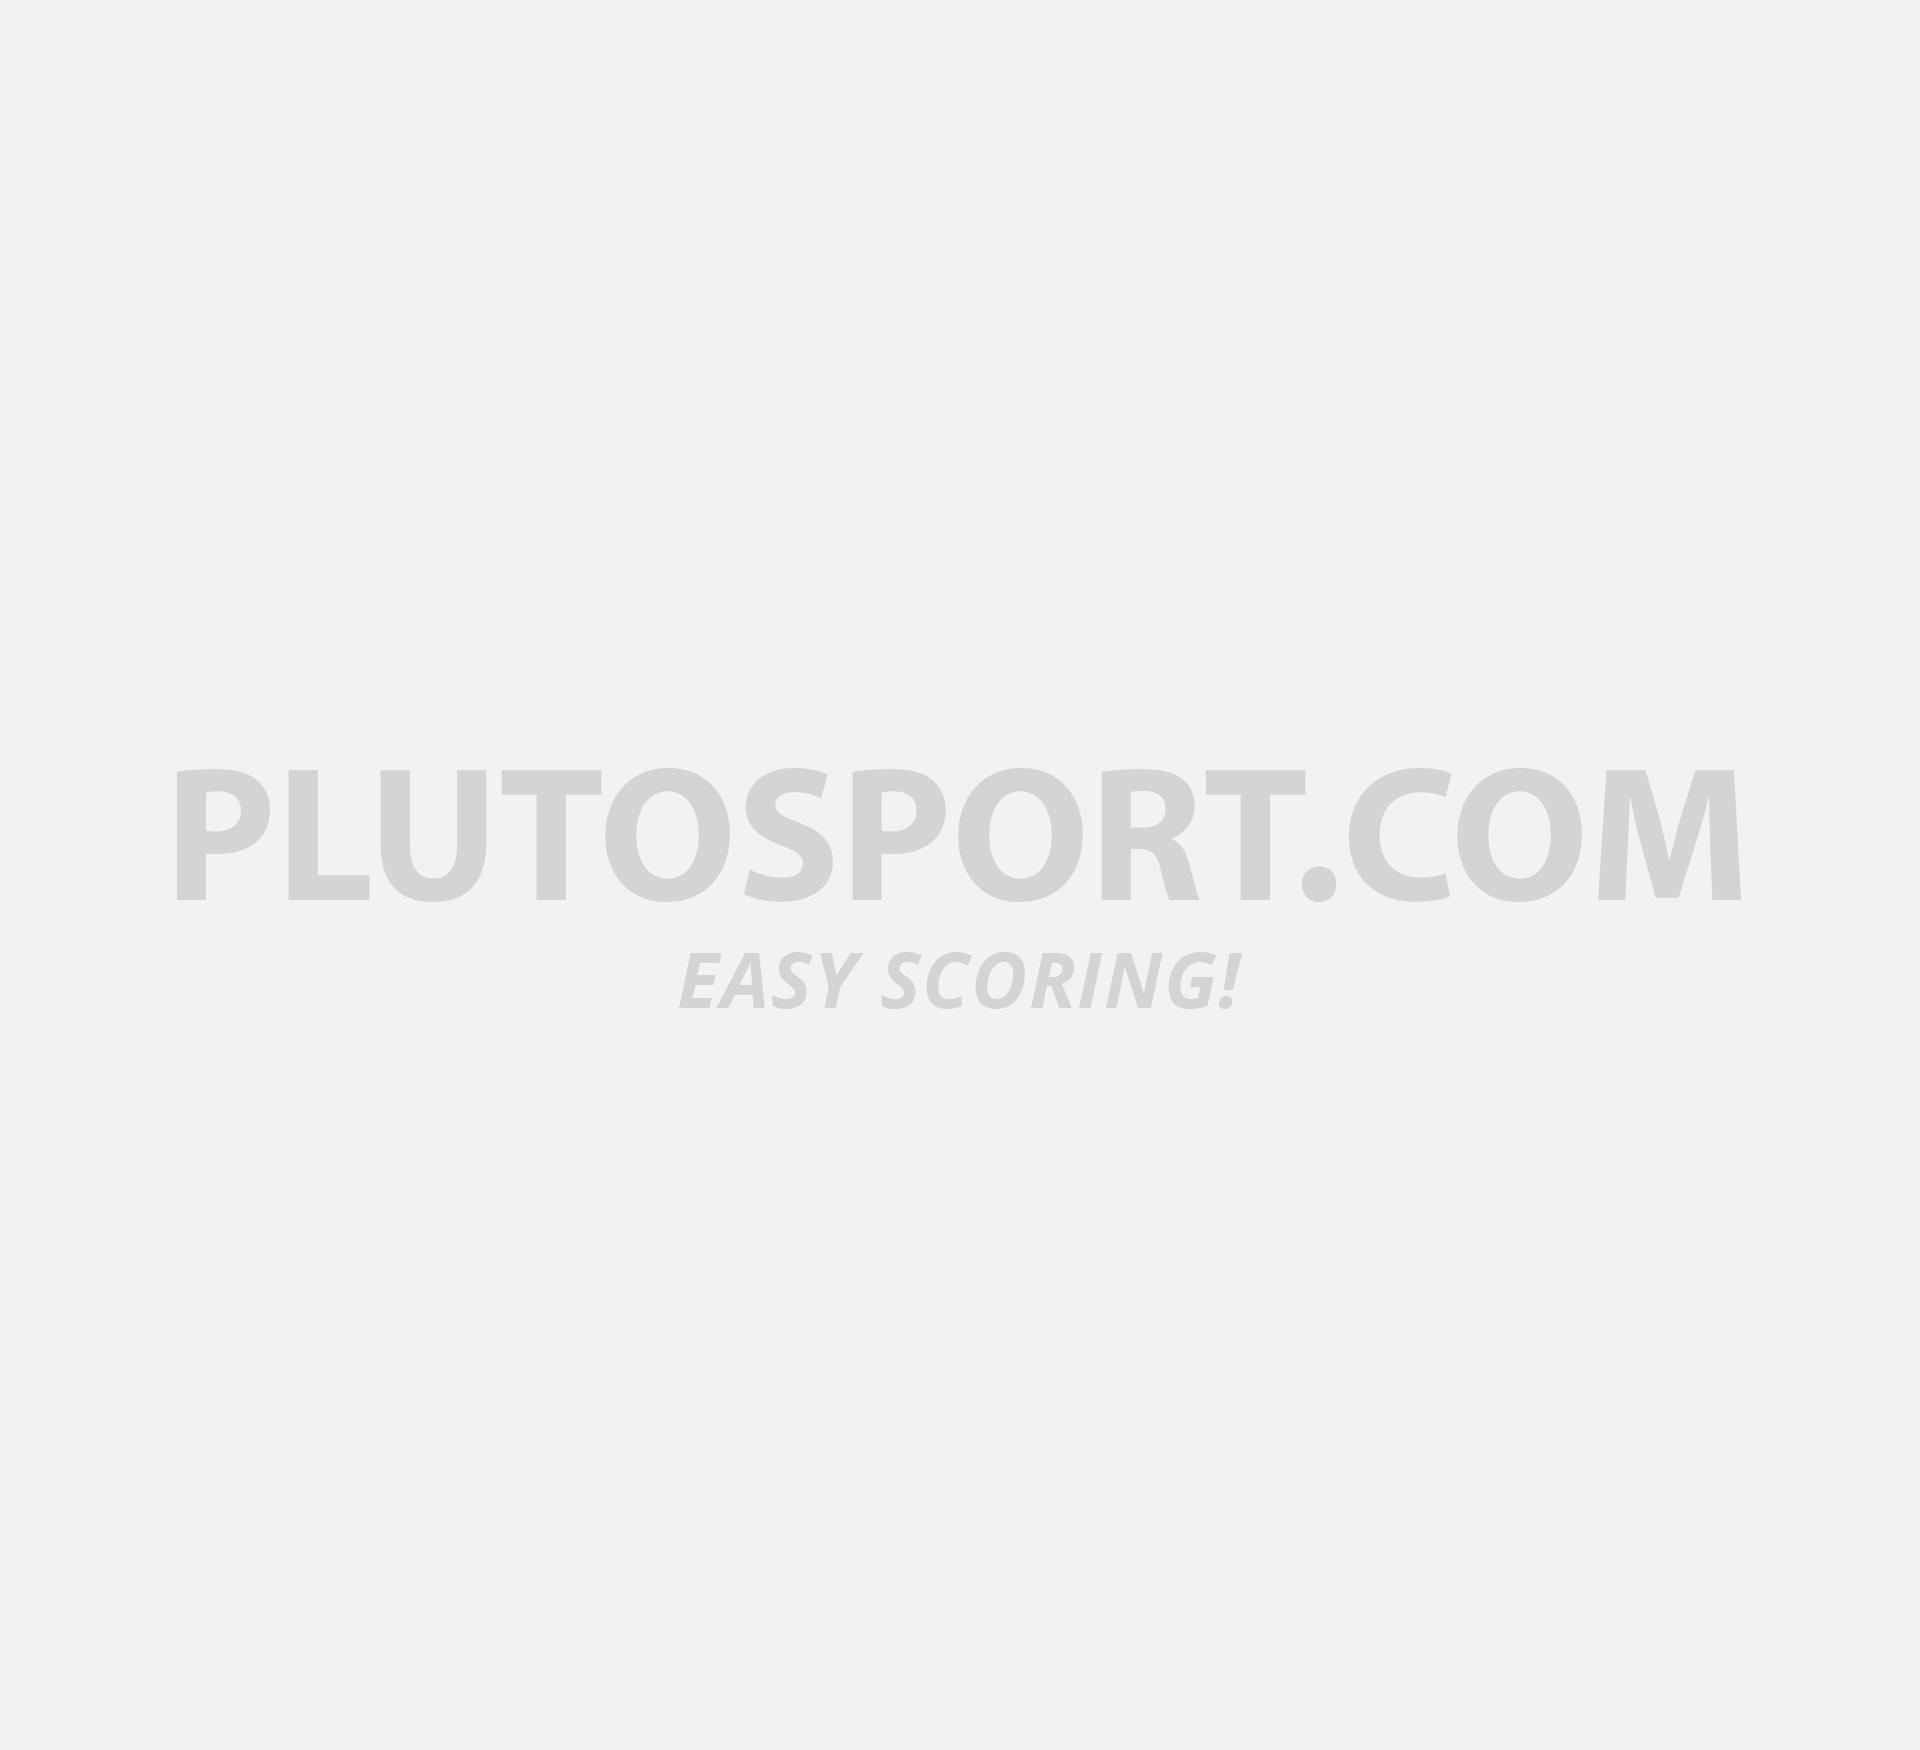 9867decfe5476b Columbia Alpine Pass Beanie - Hats - Accessories - Wintersport - Sports |  Plutosport